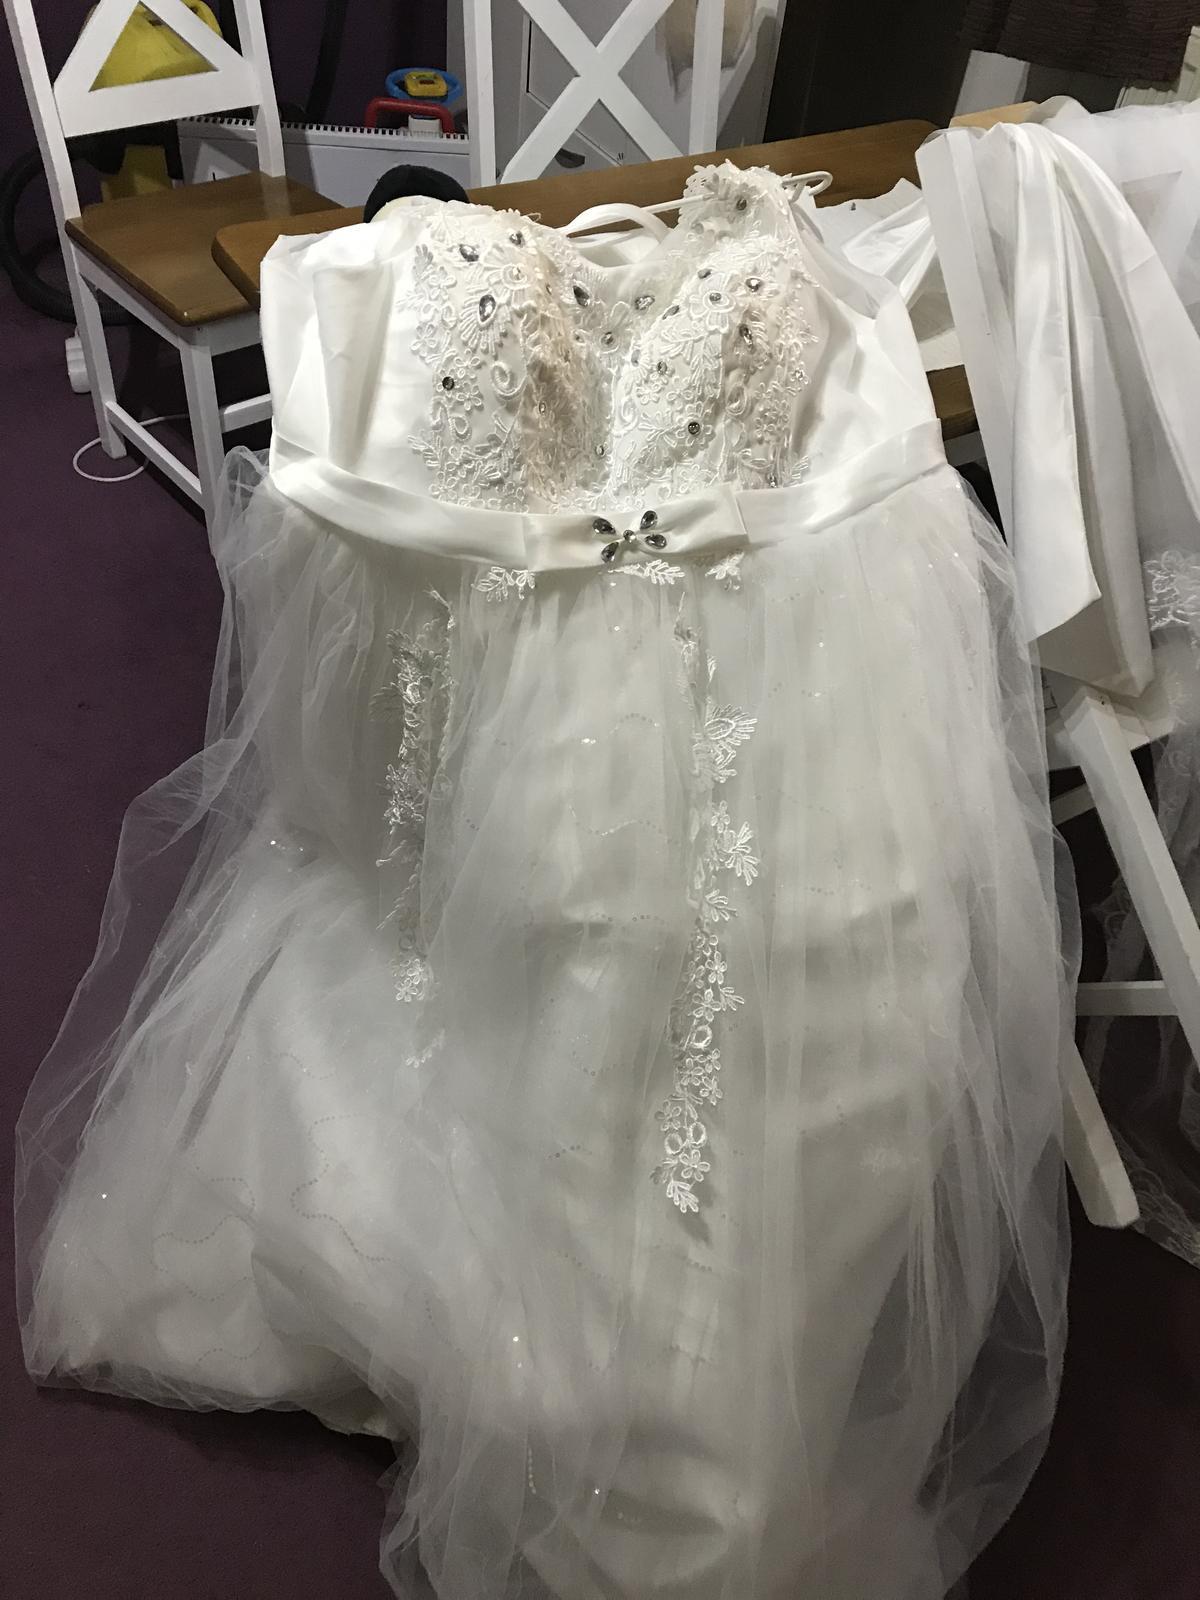 Svadobné šaty raz oblečené - Obrázok č. 1